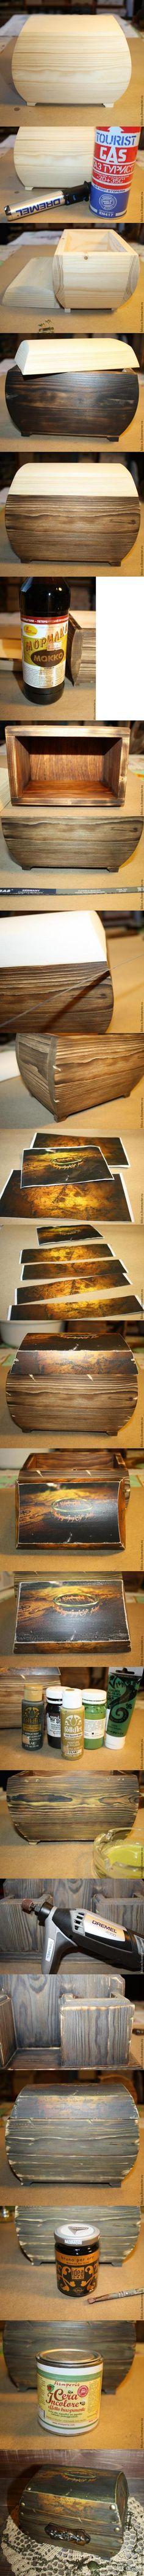 Декупаж - Сайт любителей декупажа - DCPG.RU | Старинный деревянный сундук Click on photo to see more! Нажмите на фото чтобы увидеть больше! decoupage art craft handmade home decor DIY do it yourself tutorial